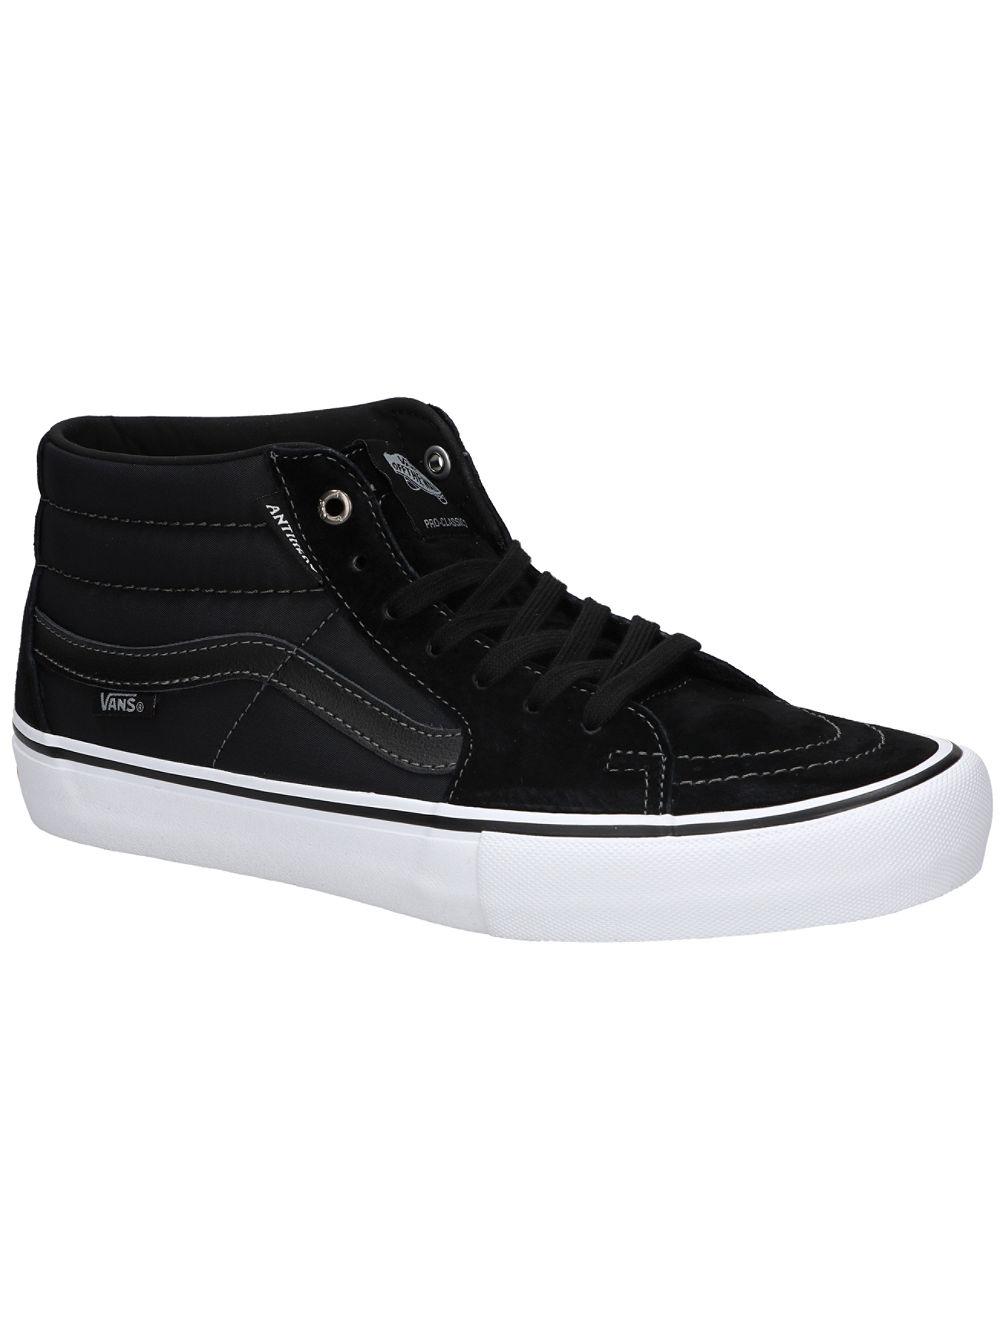 3ab7305bc0 Buy Vans X Antihero Sk8-Mid Pro Skate Shoes online at Blue Tomato